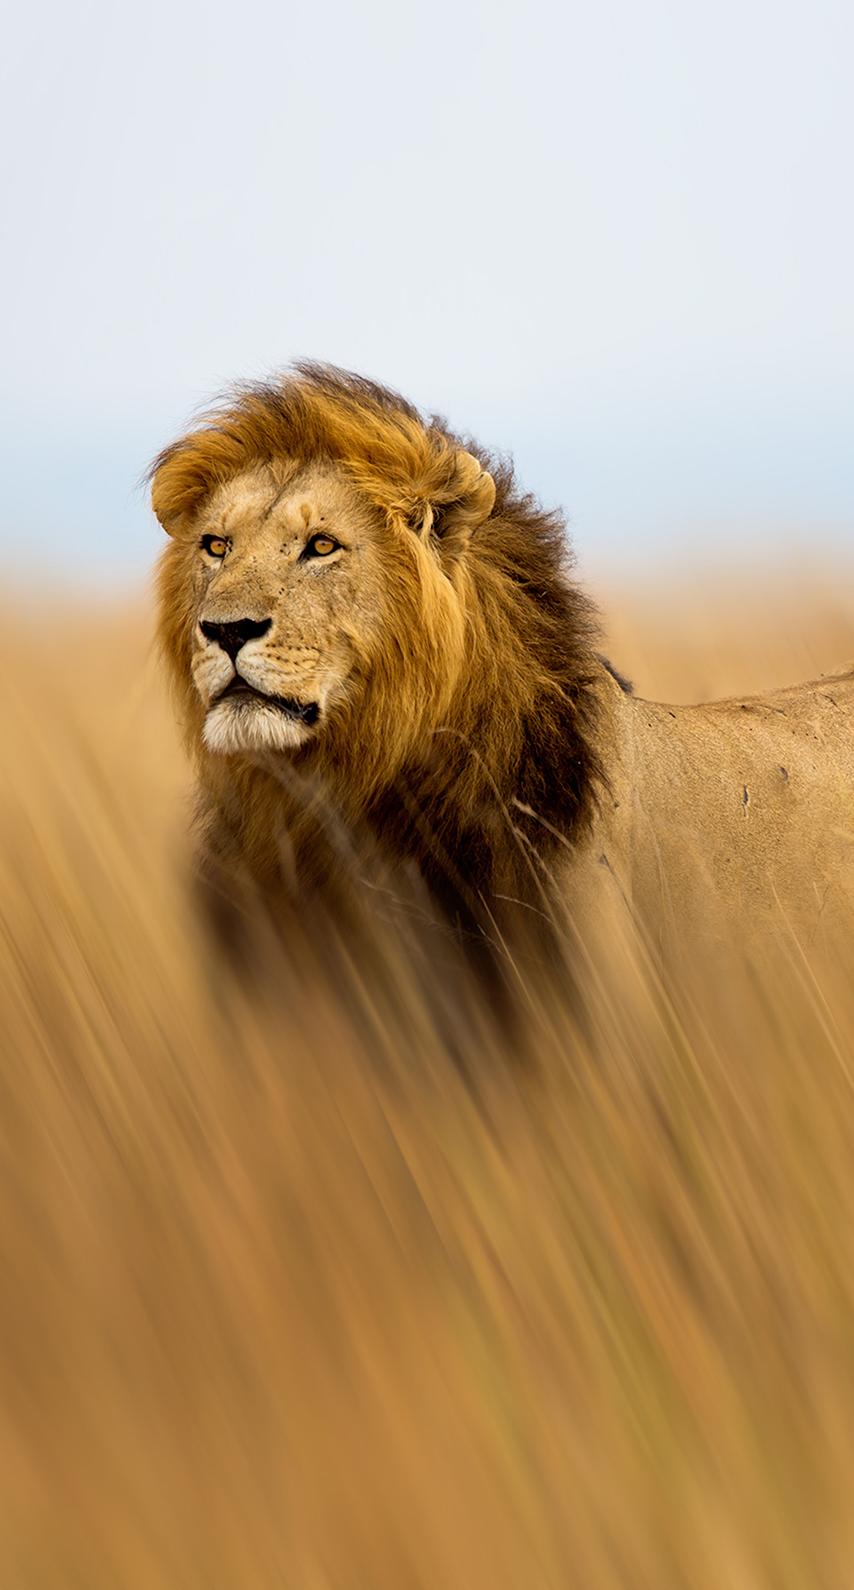 terrestrial animal, masai lion